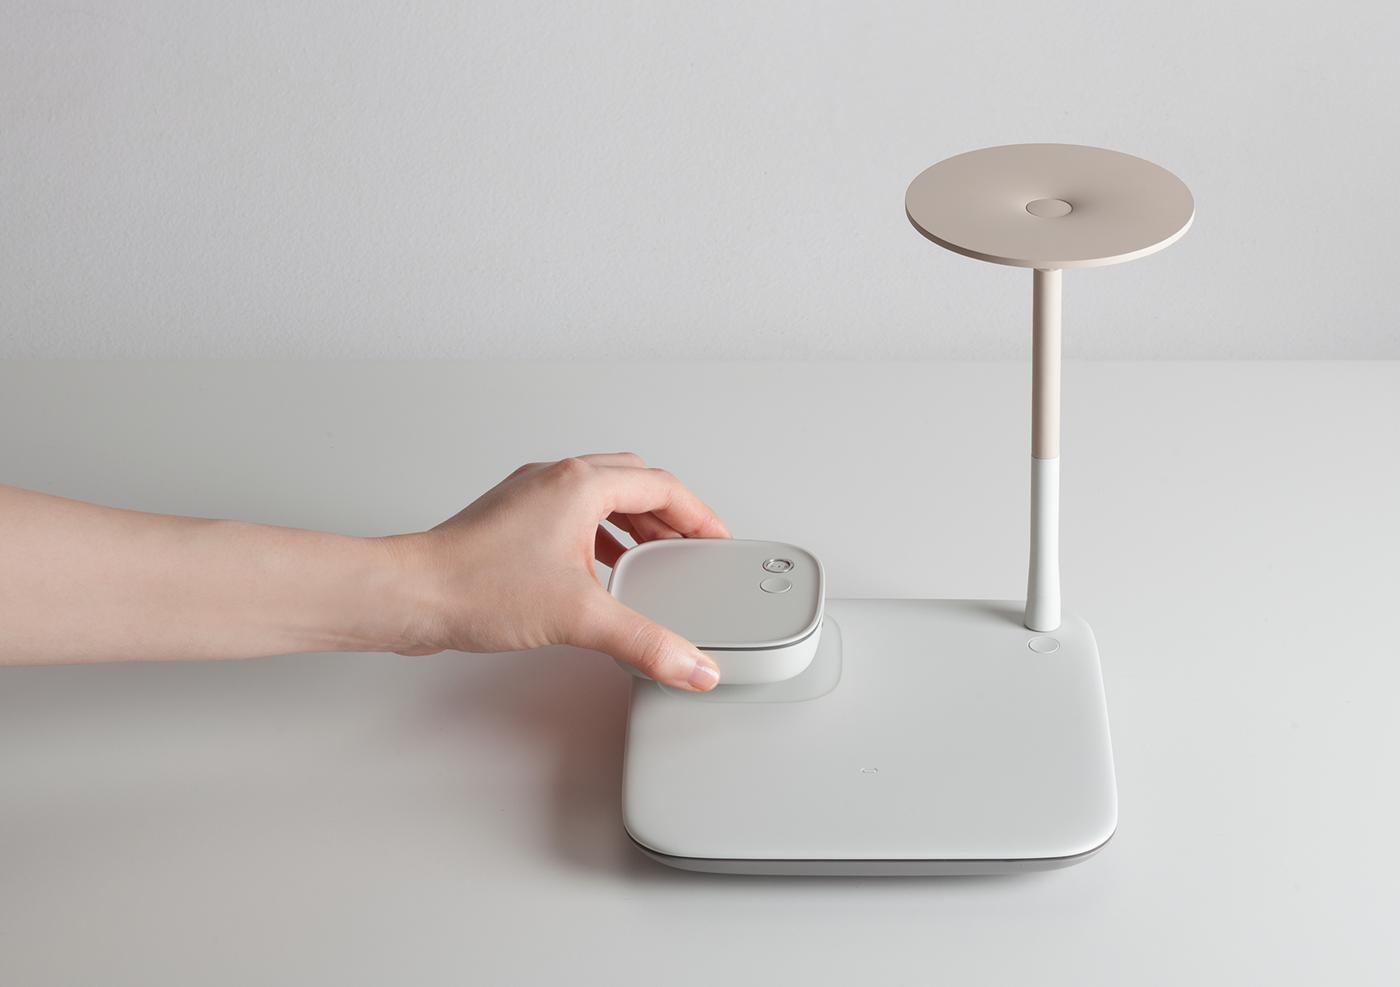 Pedora mobile pad wireless charger Smart light Samsung bkid